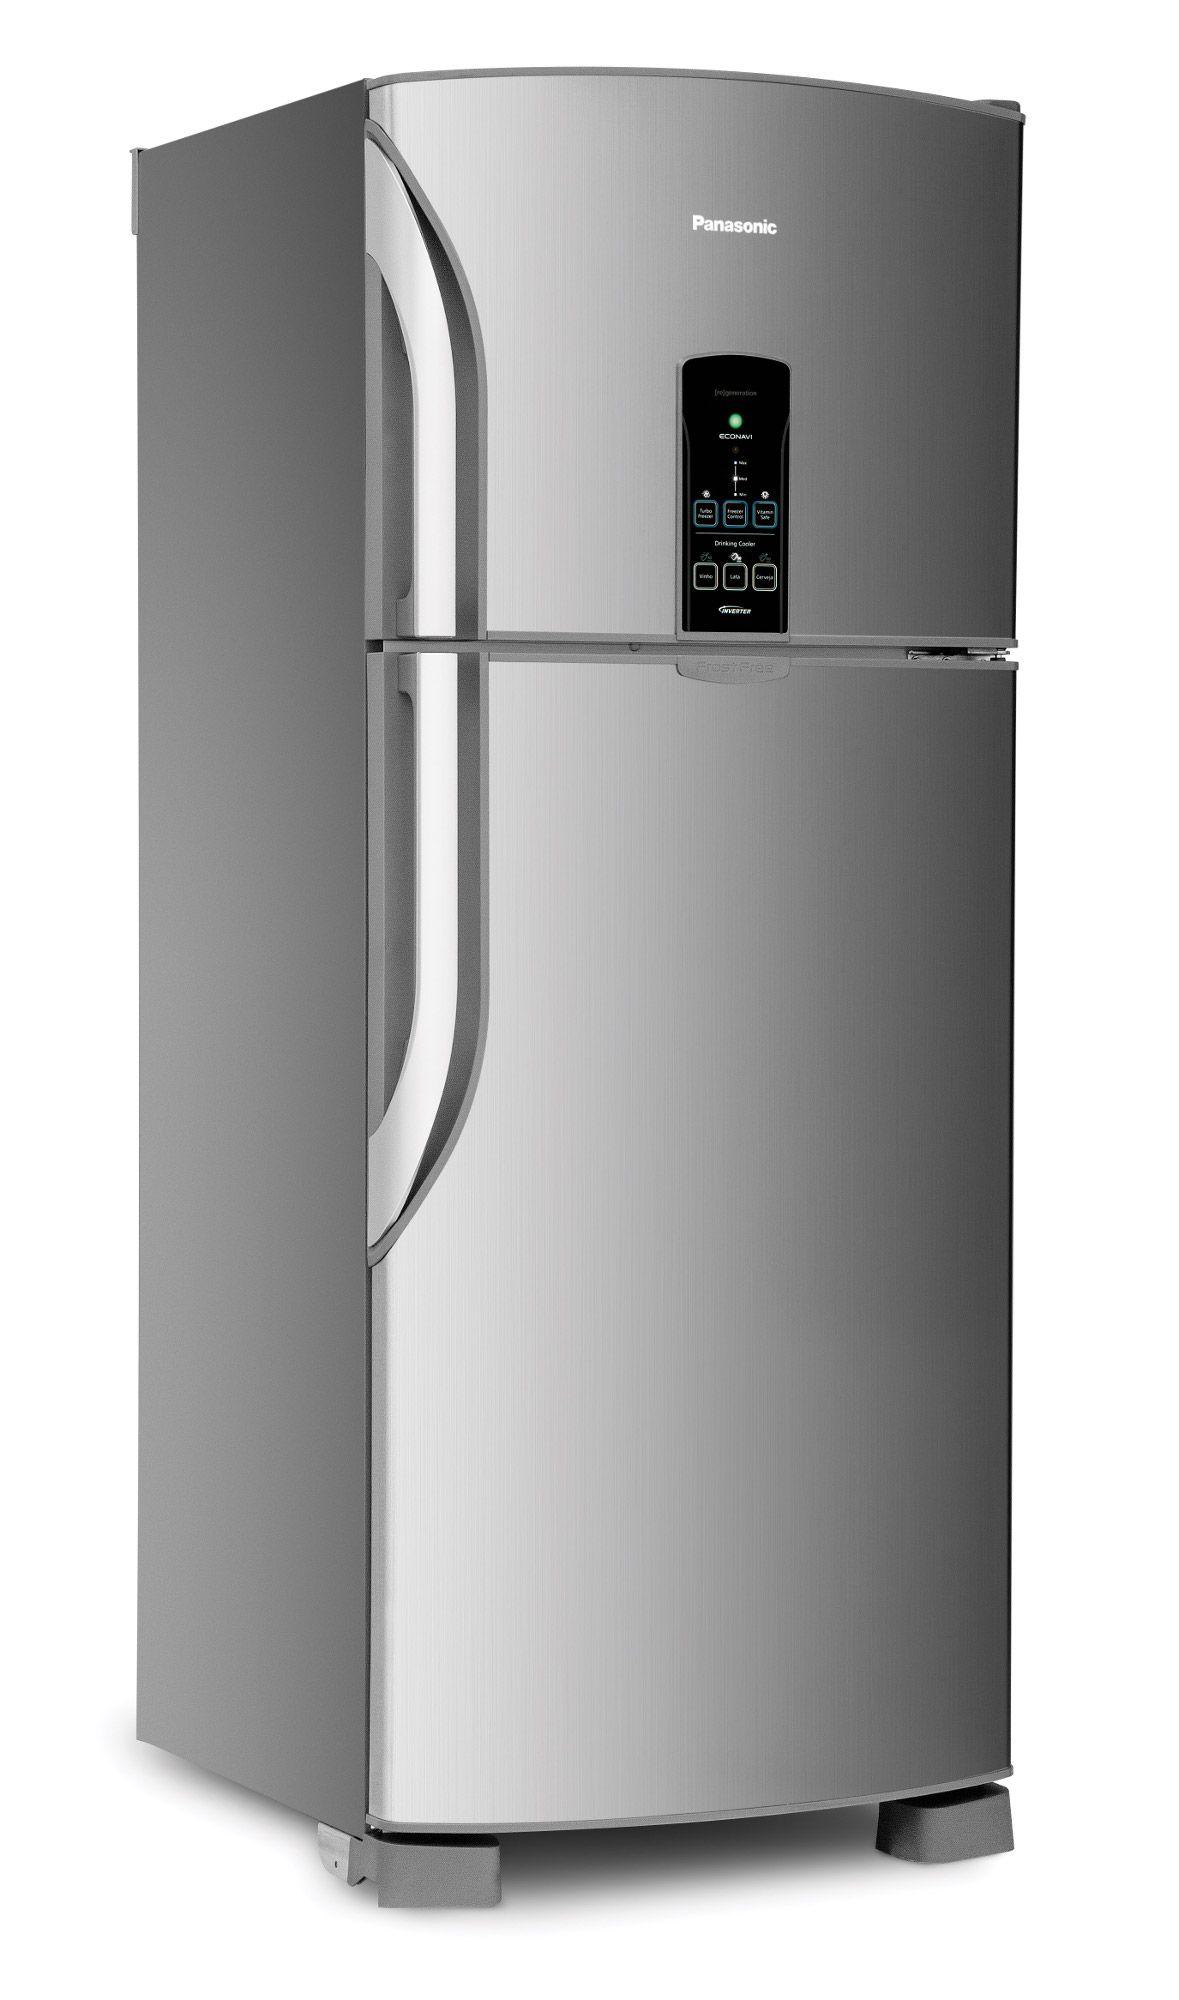 Geladeira Refrigerador Panasonic Inox Nrbt49 Amgeloni Jpg 1179 2000